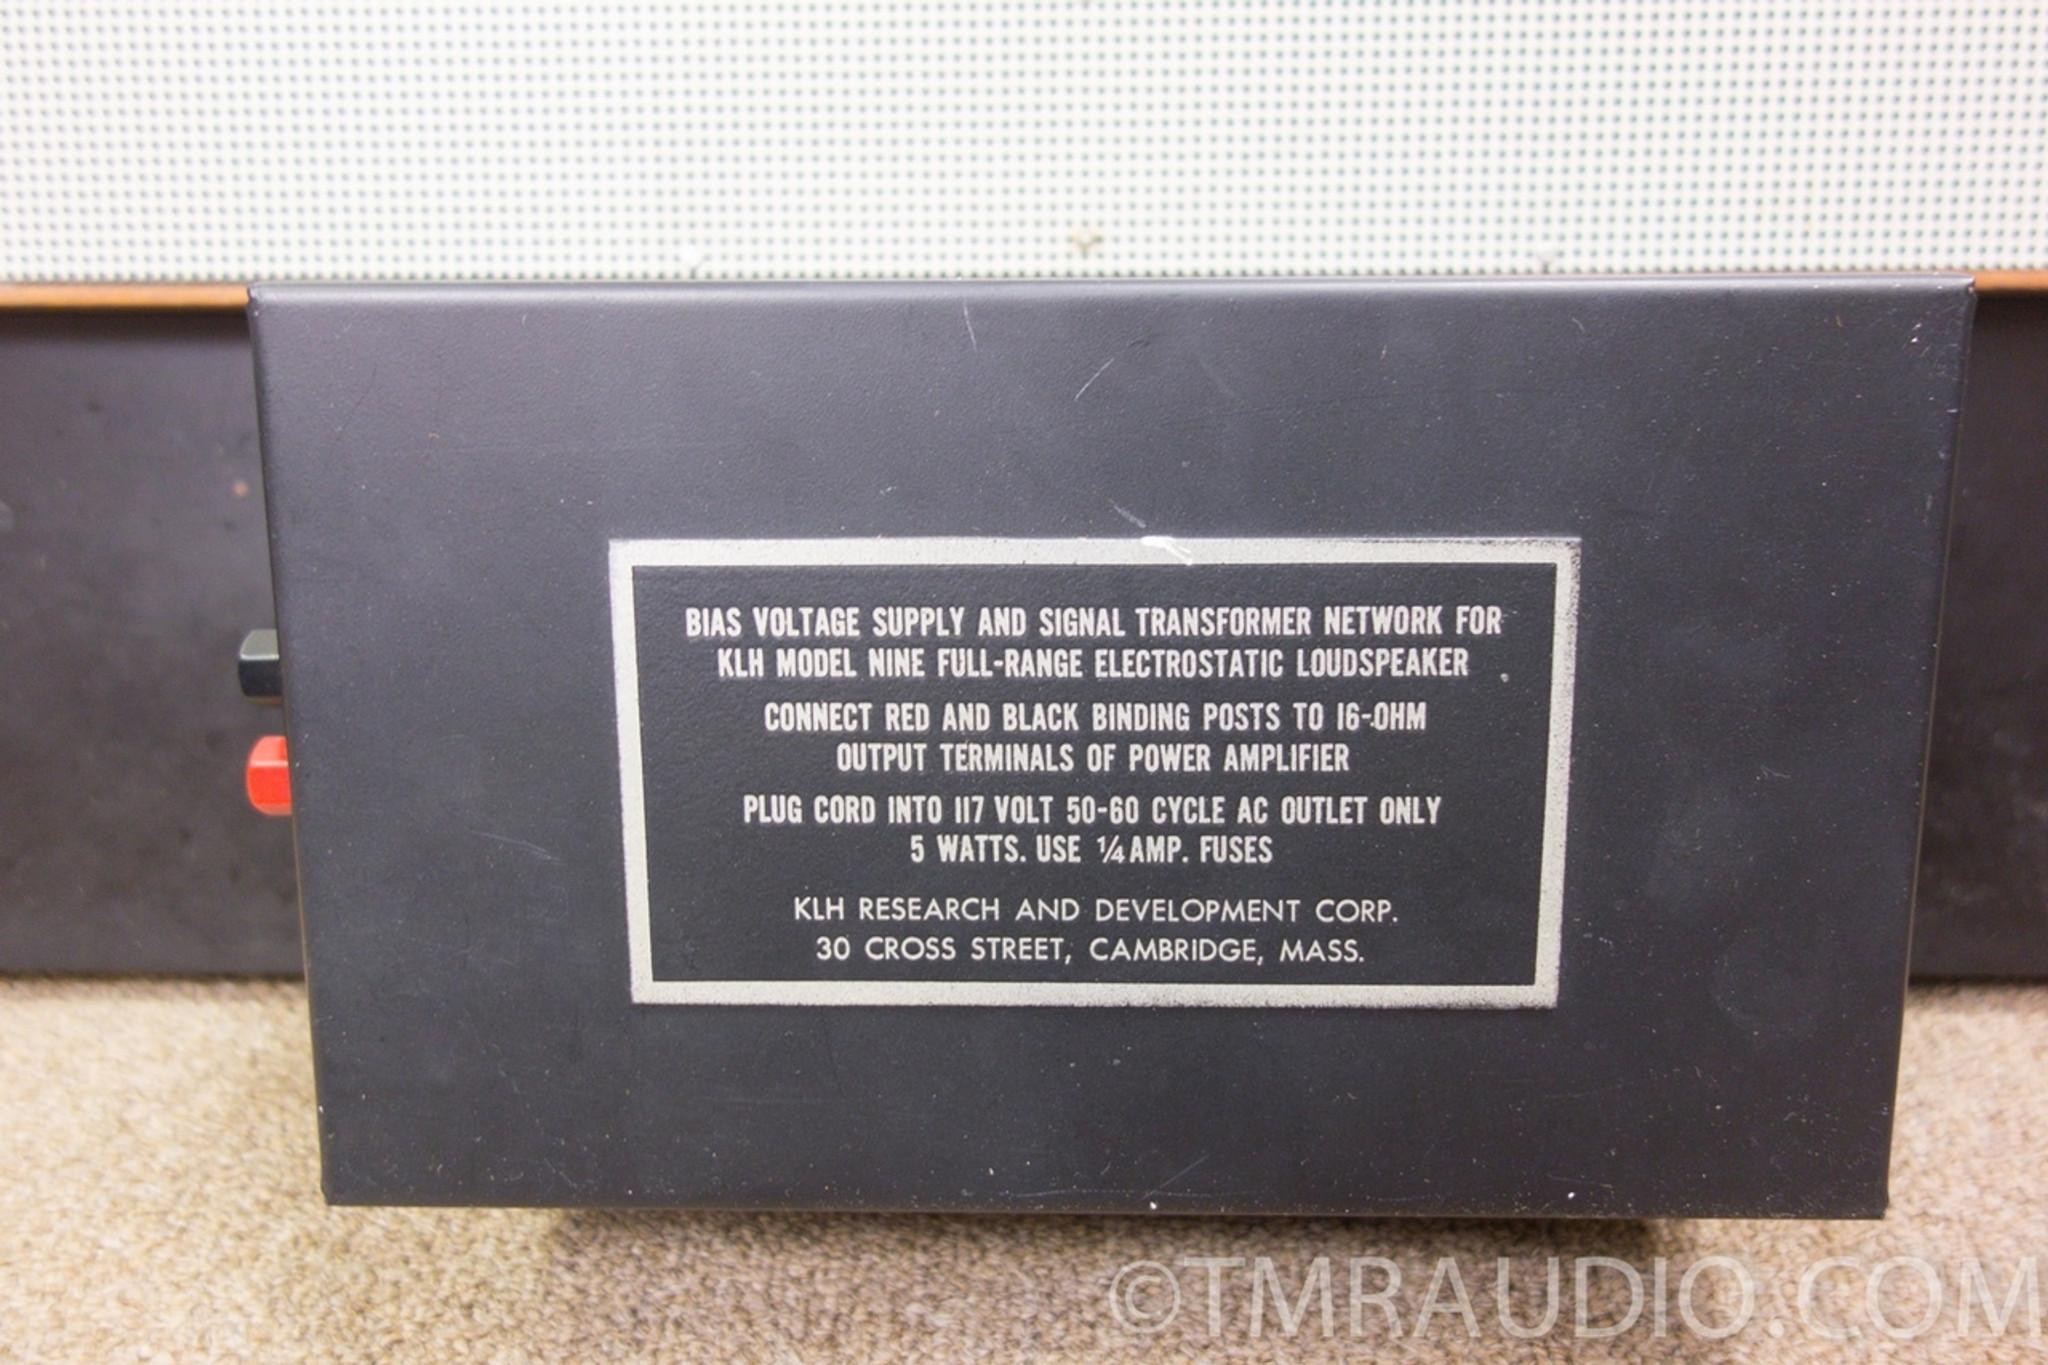 medium resolution of klh model 9 vintage electrostatic speakers in factory box one owner stunning klh